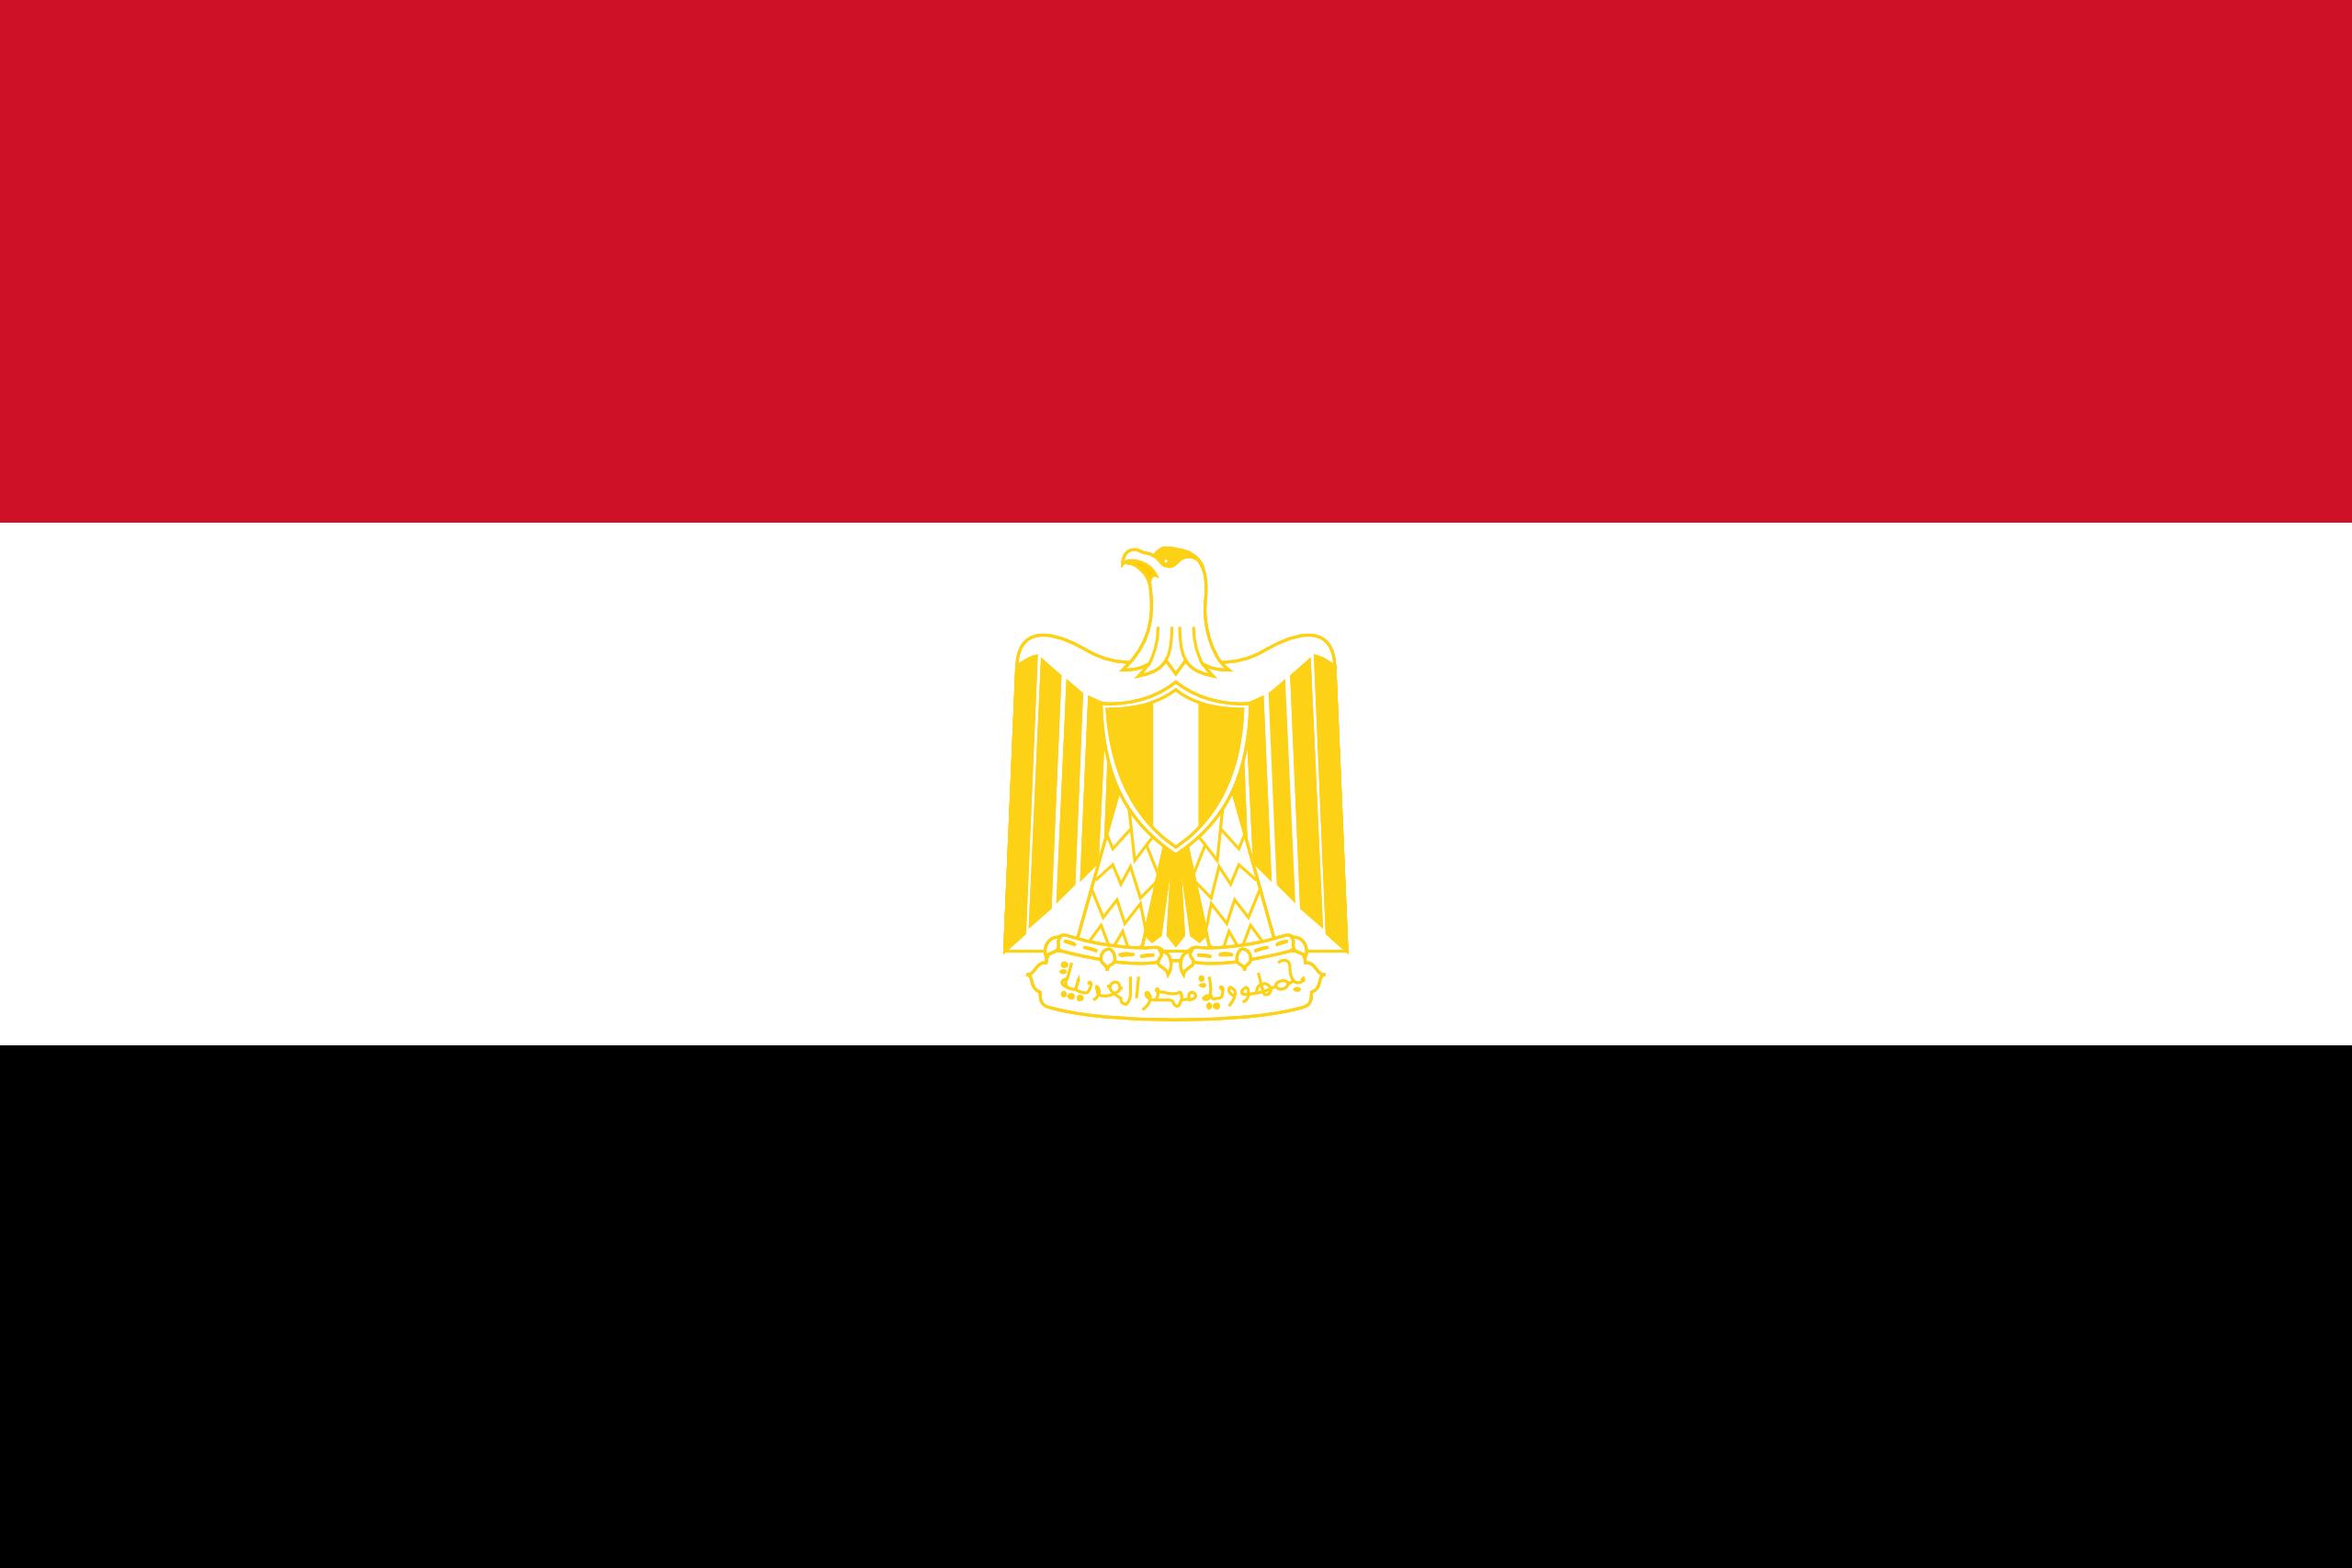 egipto, 国家, 会徽, 徽标, 符号 - 高清壁纸 - 教授-falken.com